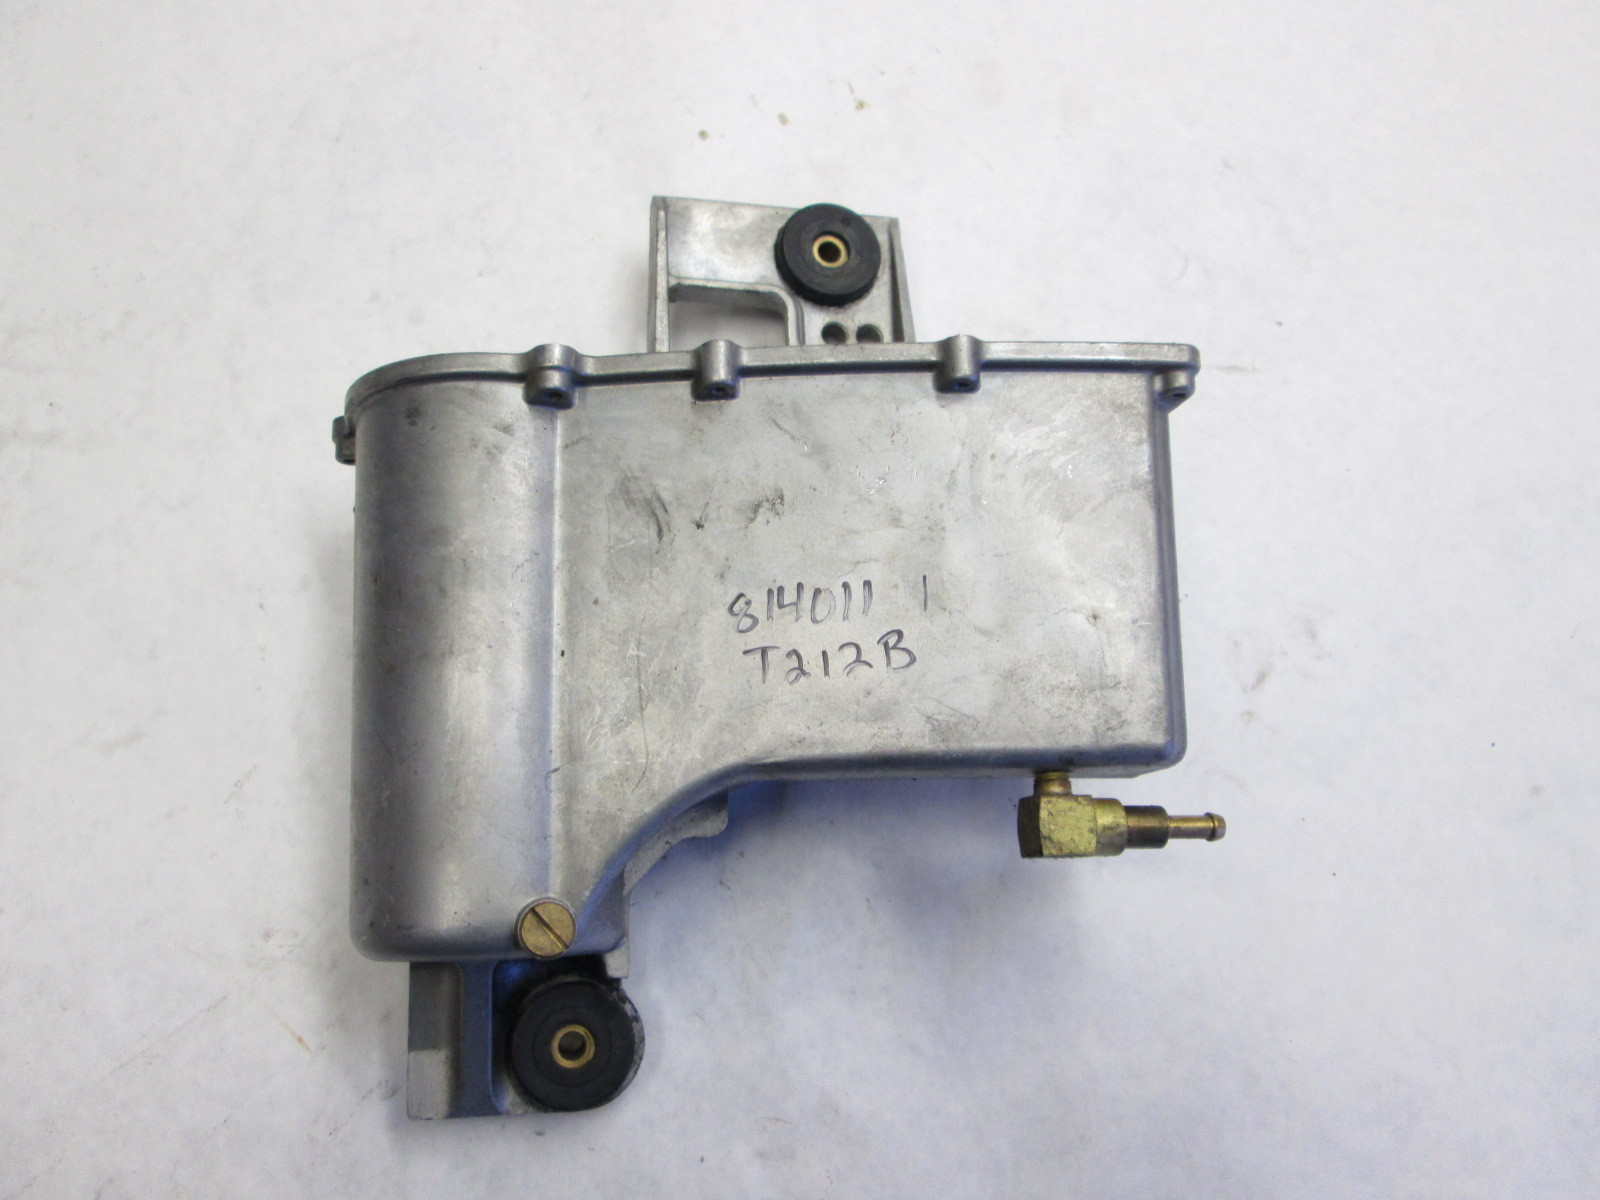 814011 1 Mercury Outboard Efi Fuel Management Vapor